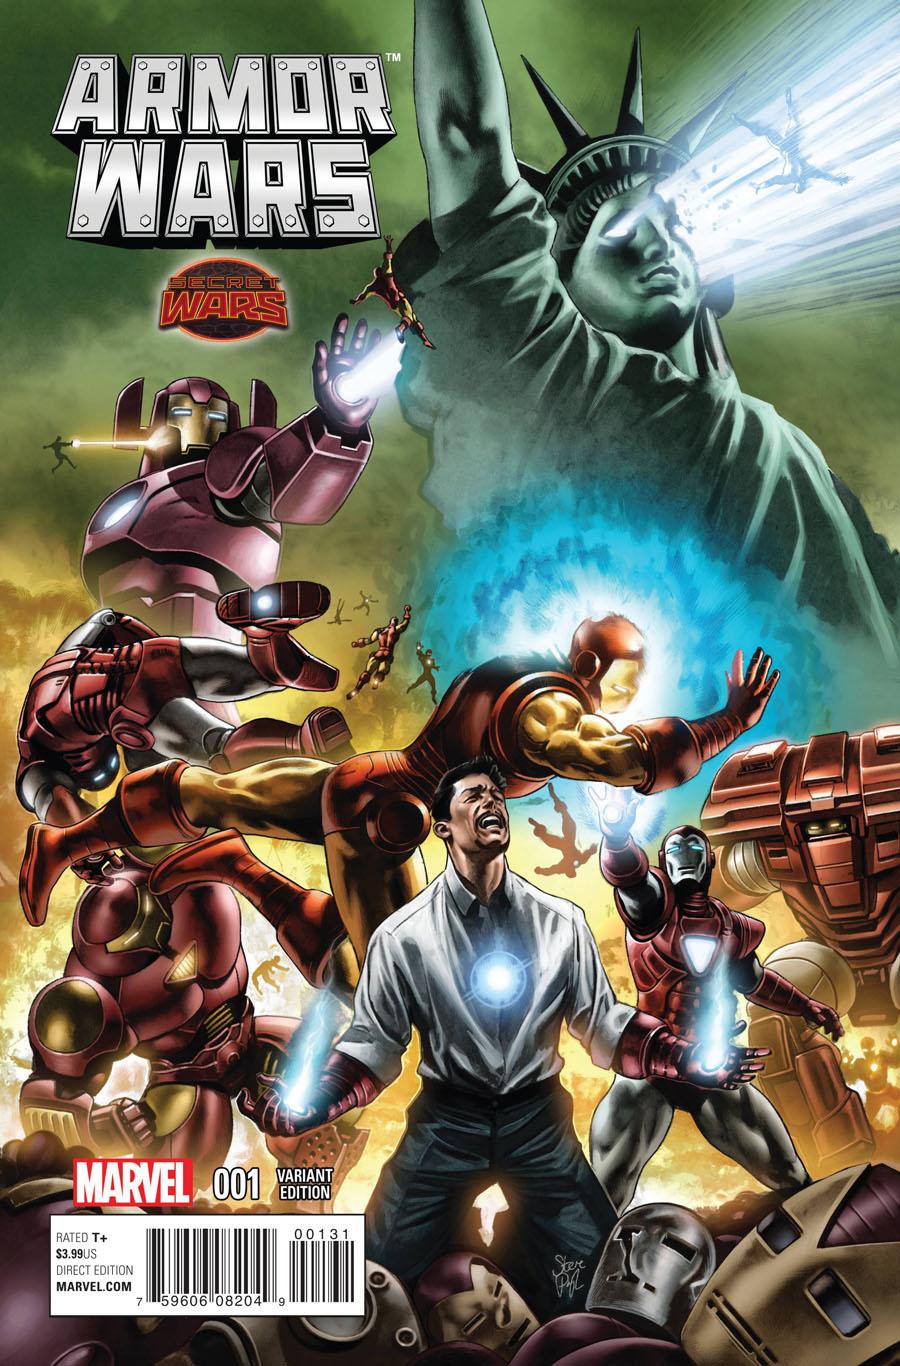 Armor Wars #1 Cover G Incentive Steve Pugh Variant Cover (Secret Wars Warzones Tie-In)